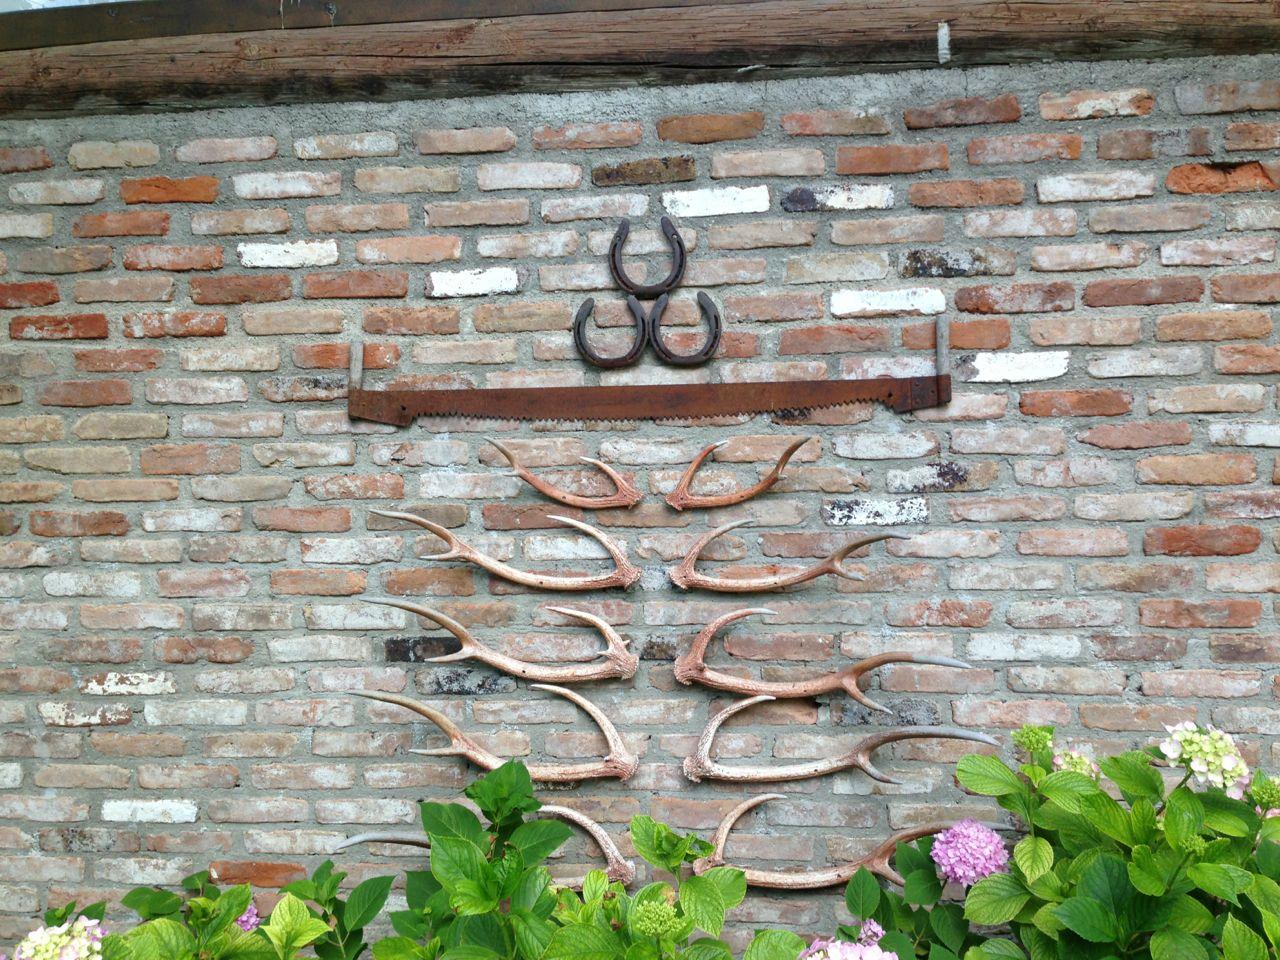 Portakalçiçegi Sanat Kolonisi Giorgio Bertozzi11